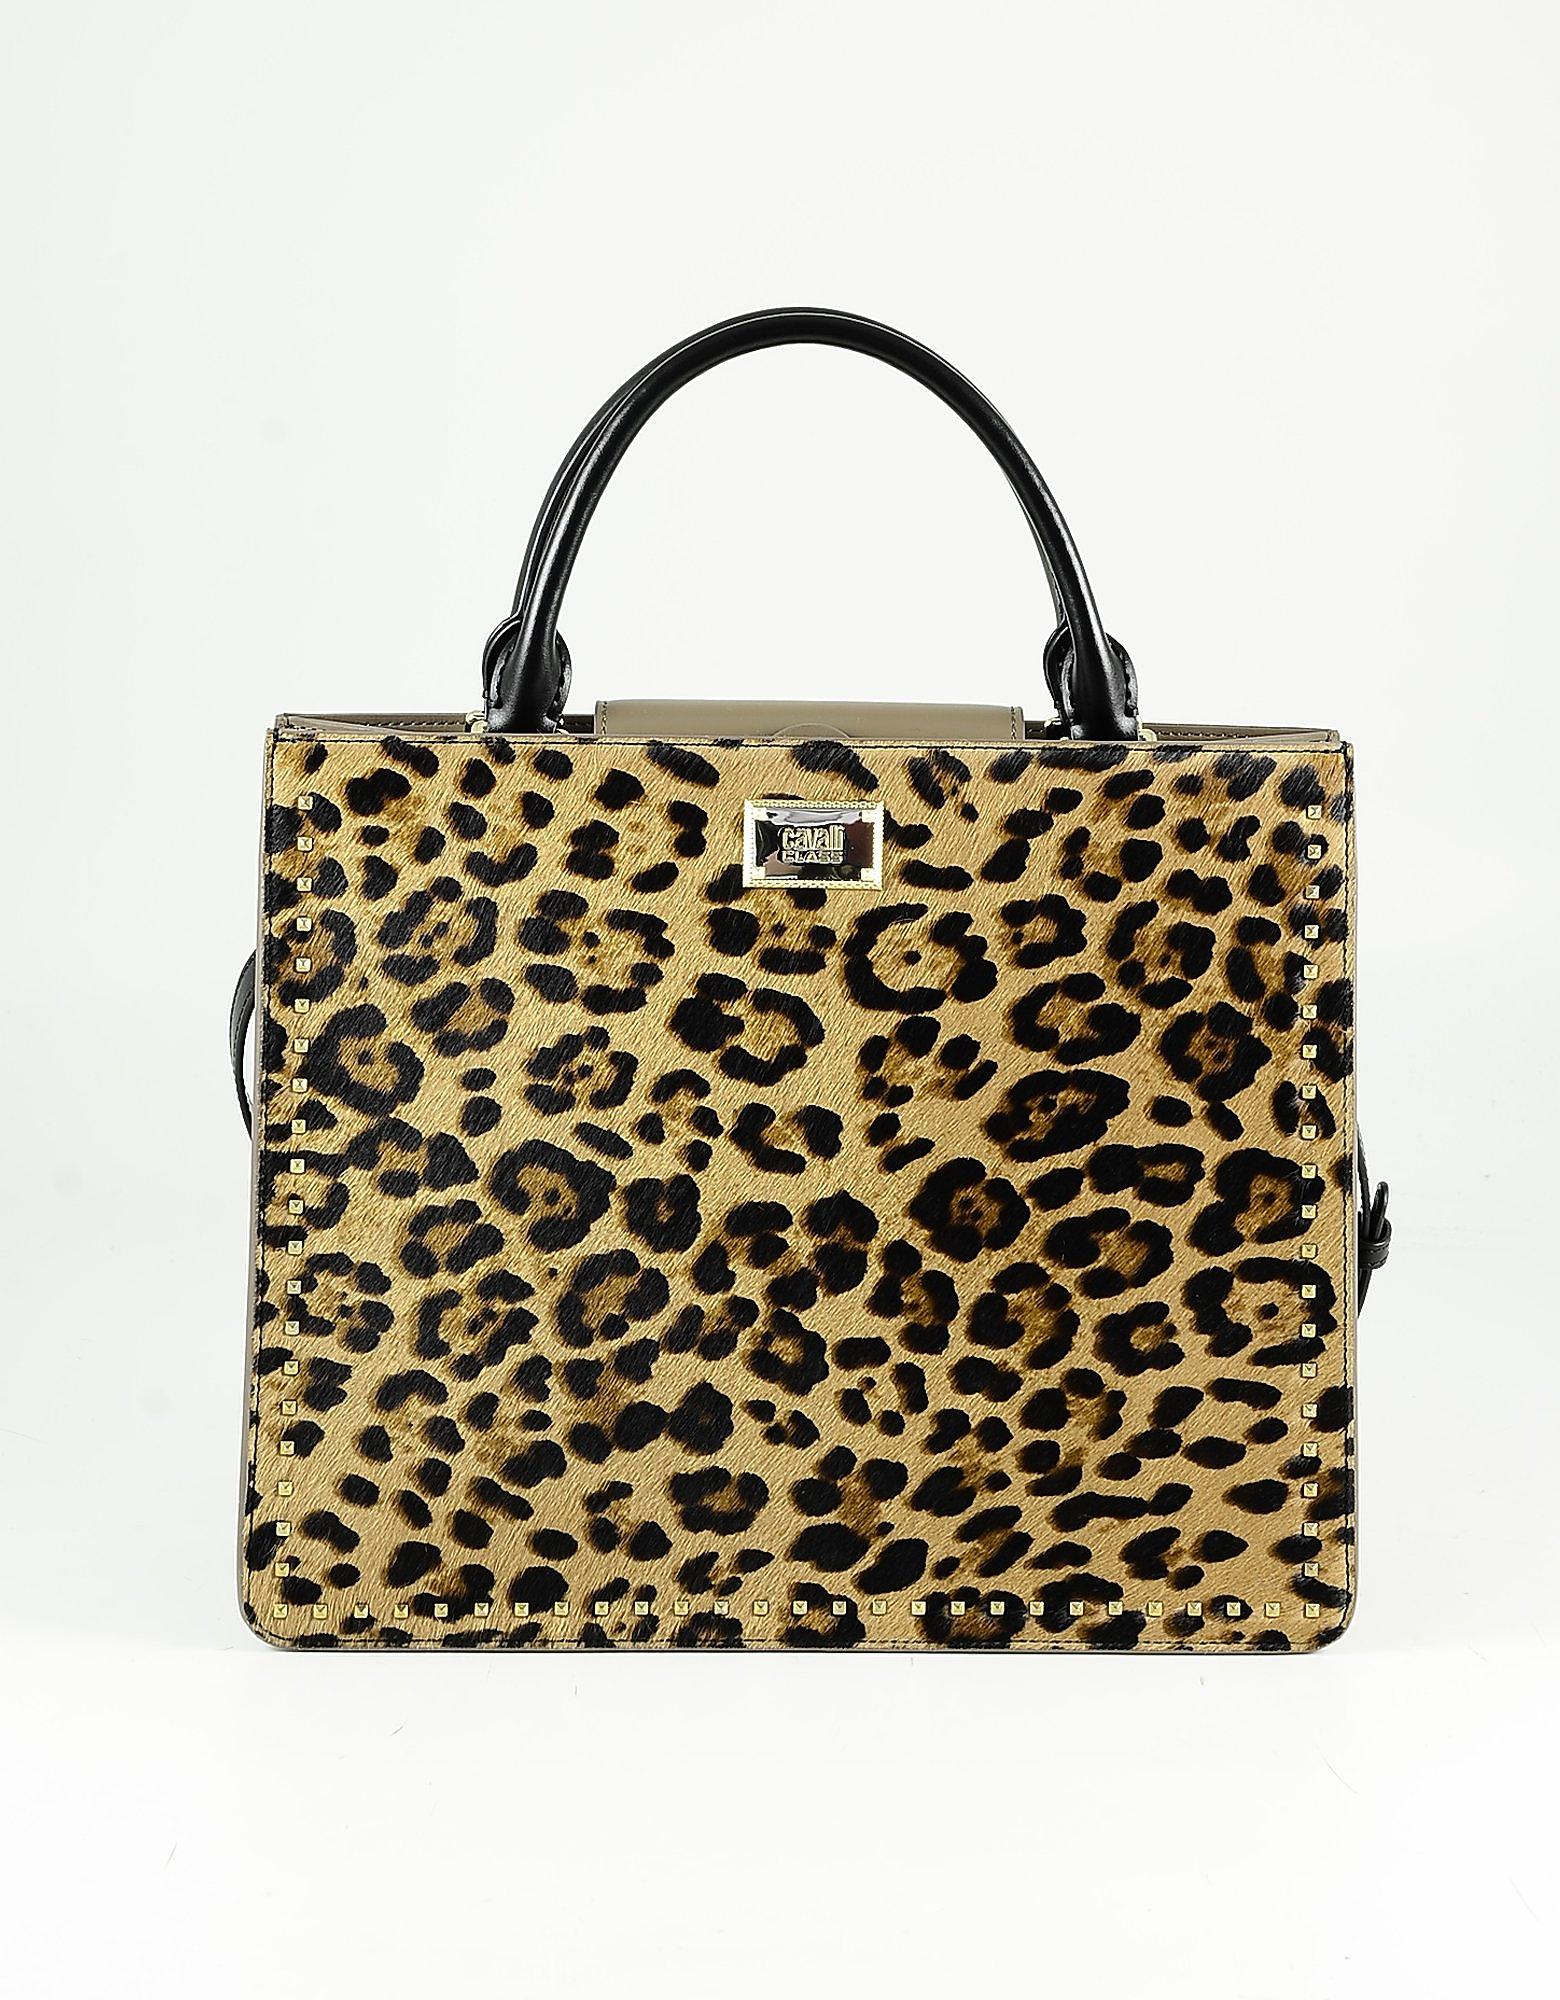 Class Roberto Cavalli Brown Hair-cal Leather Tote Bag